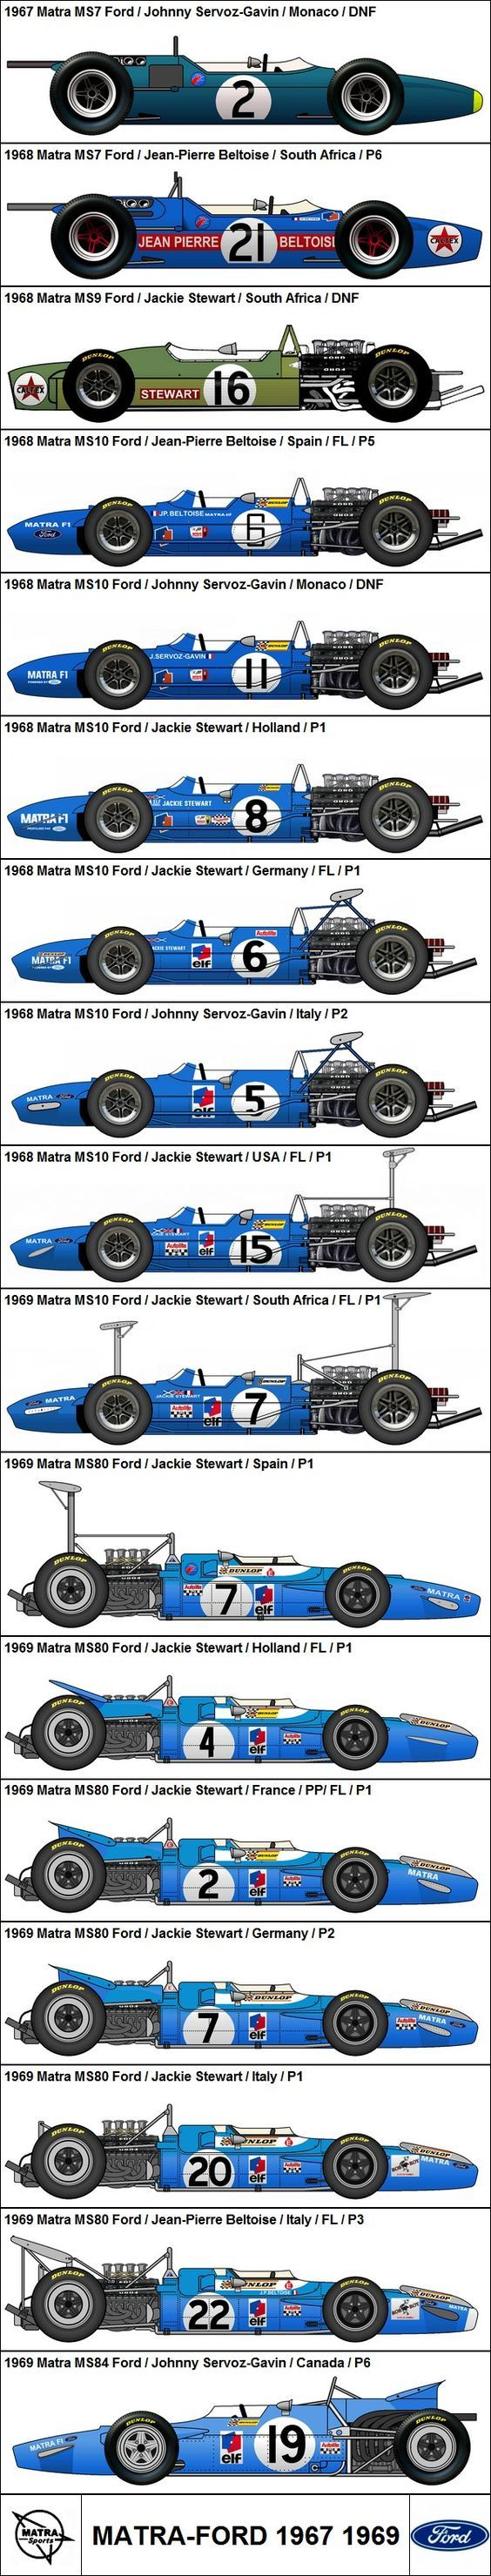 Formula One Grand Prix Matra-Ford 1967-1969: